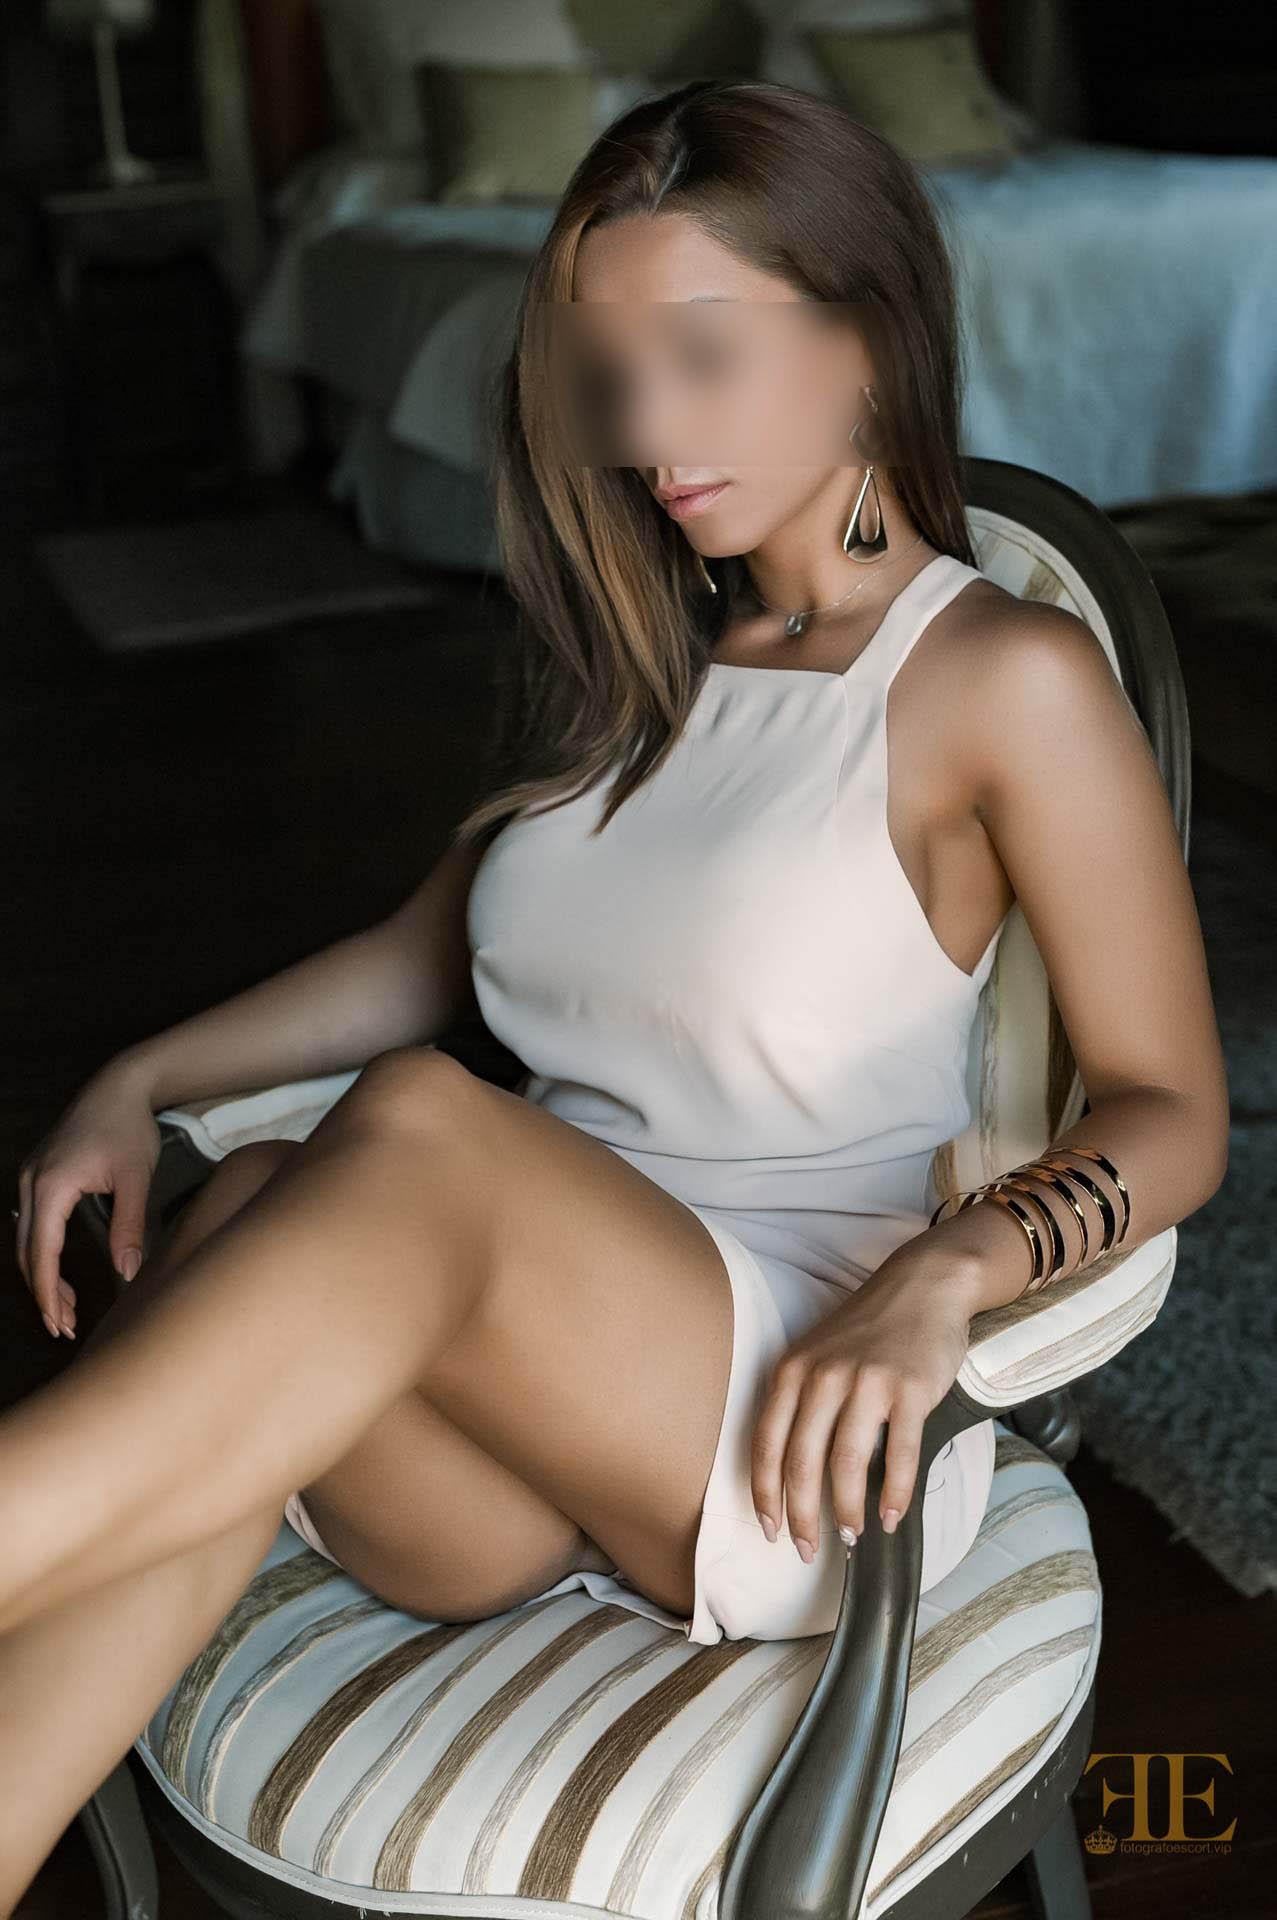 Fotografo erotico para escort 005